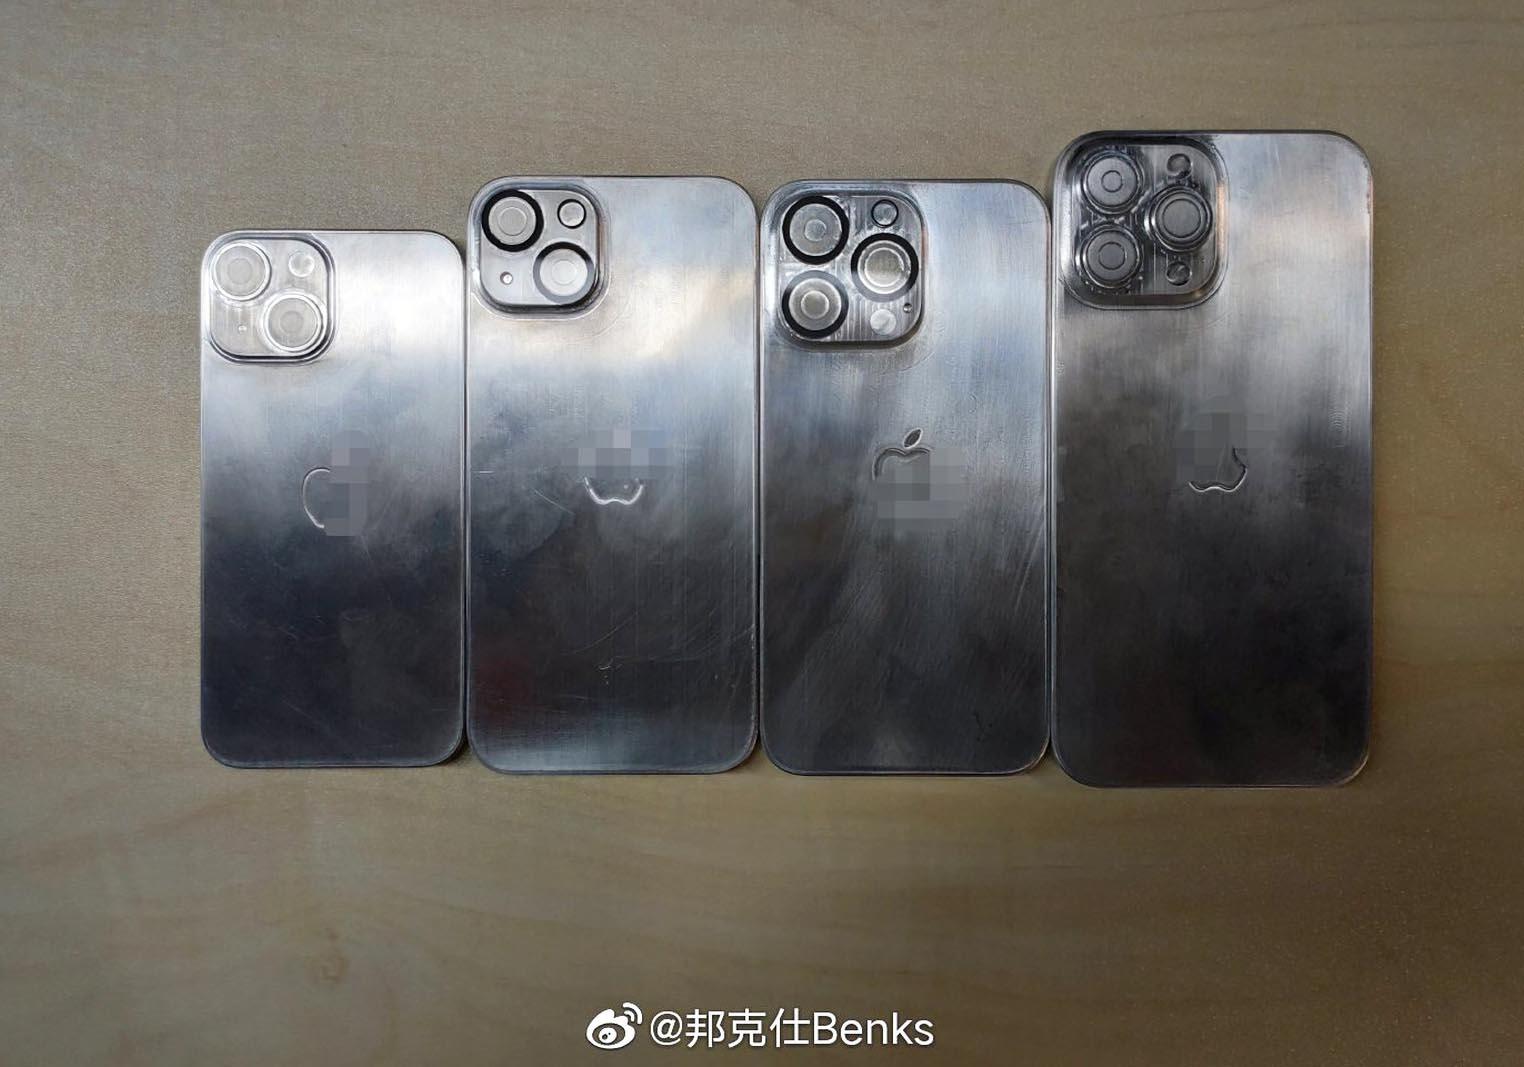 IPhone 13 Benks models